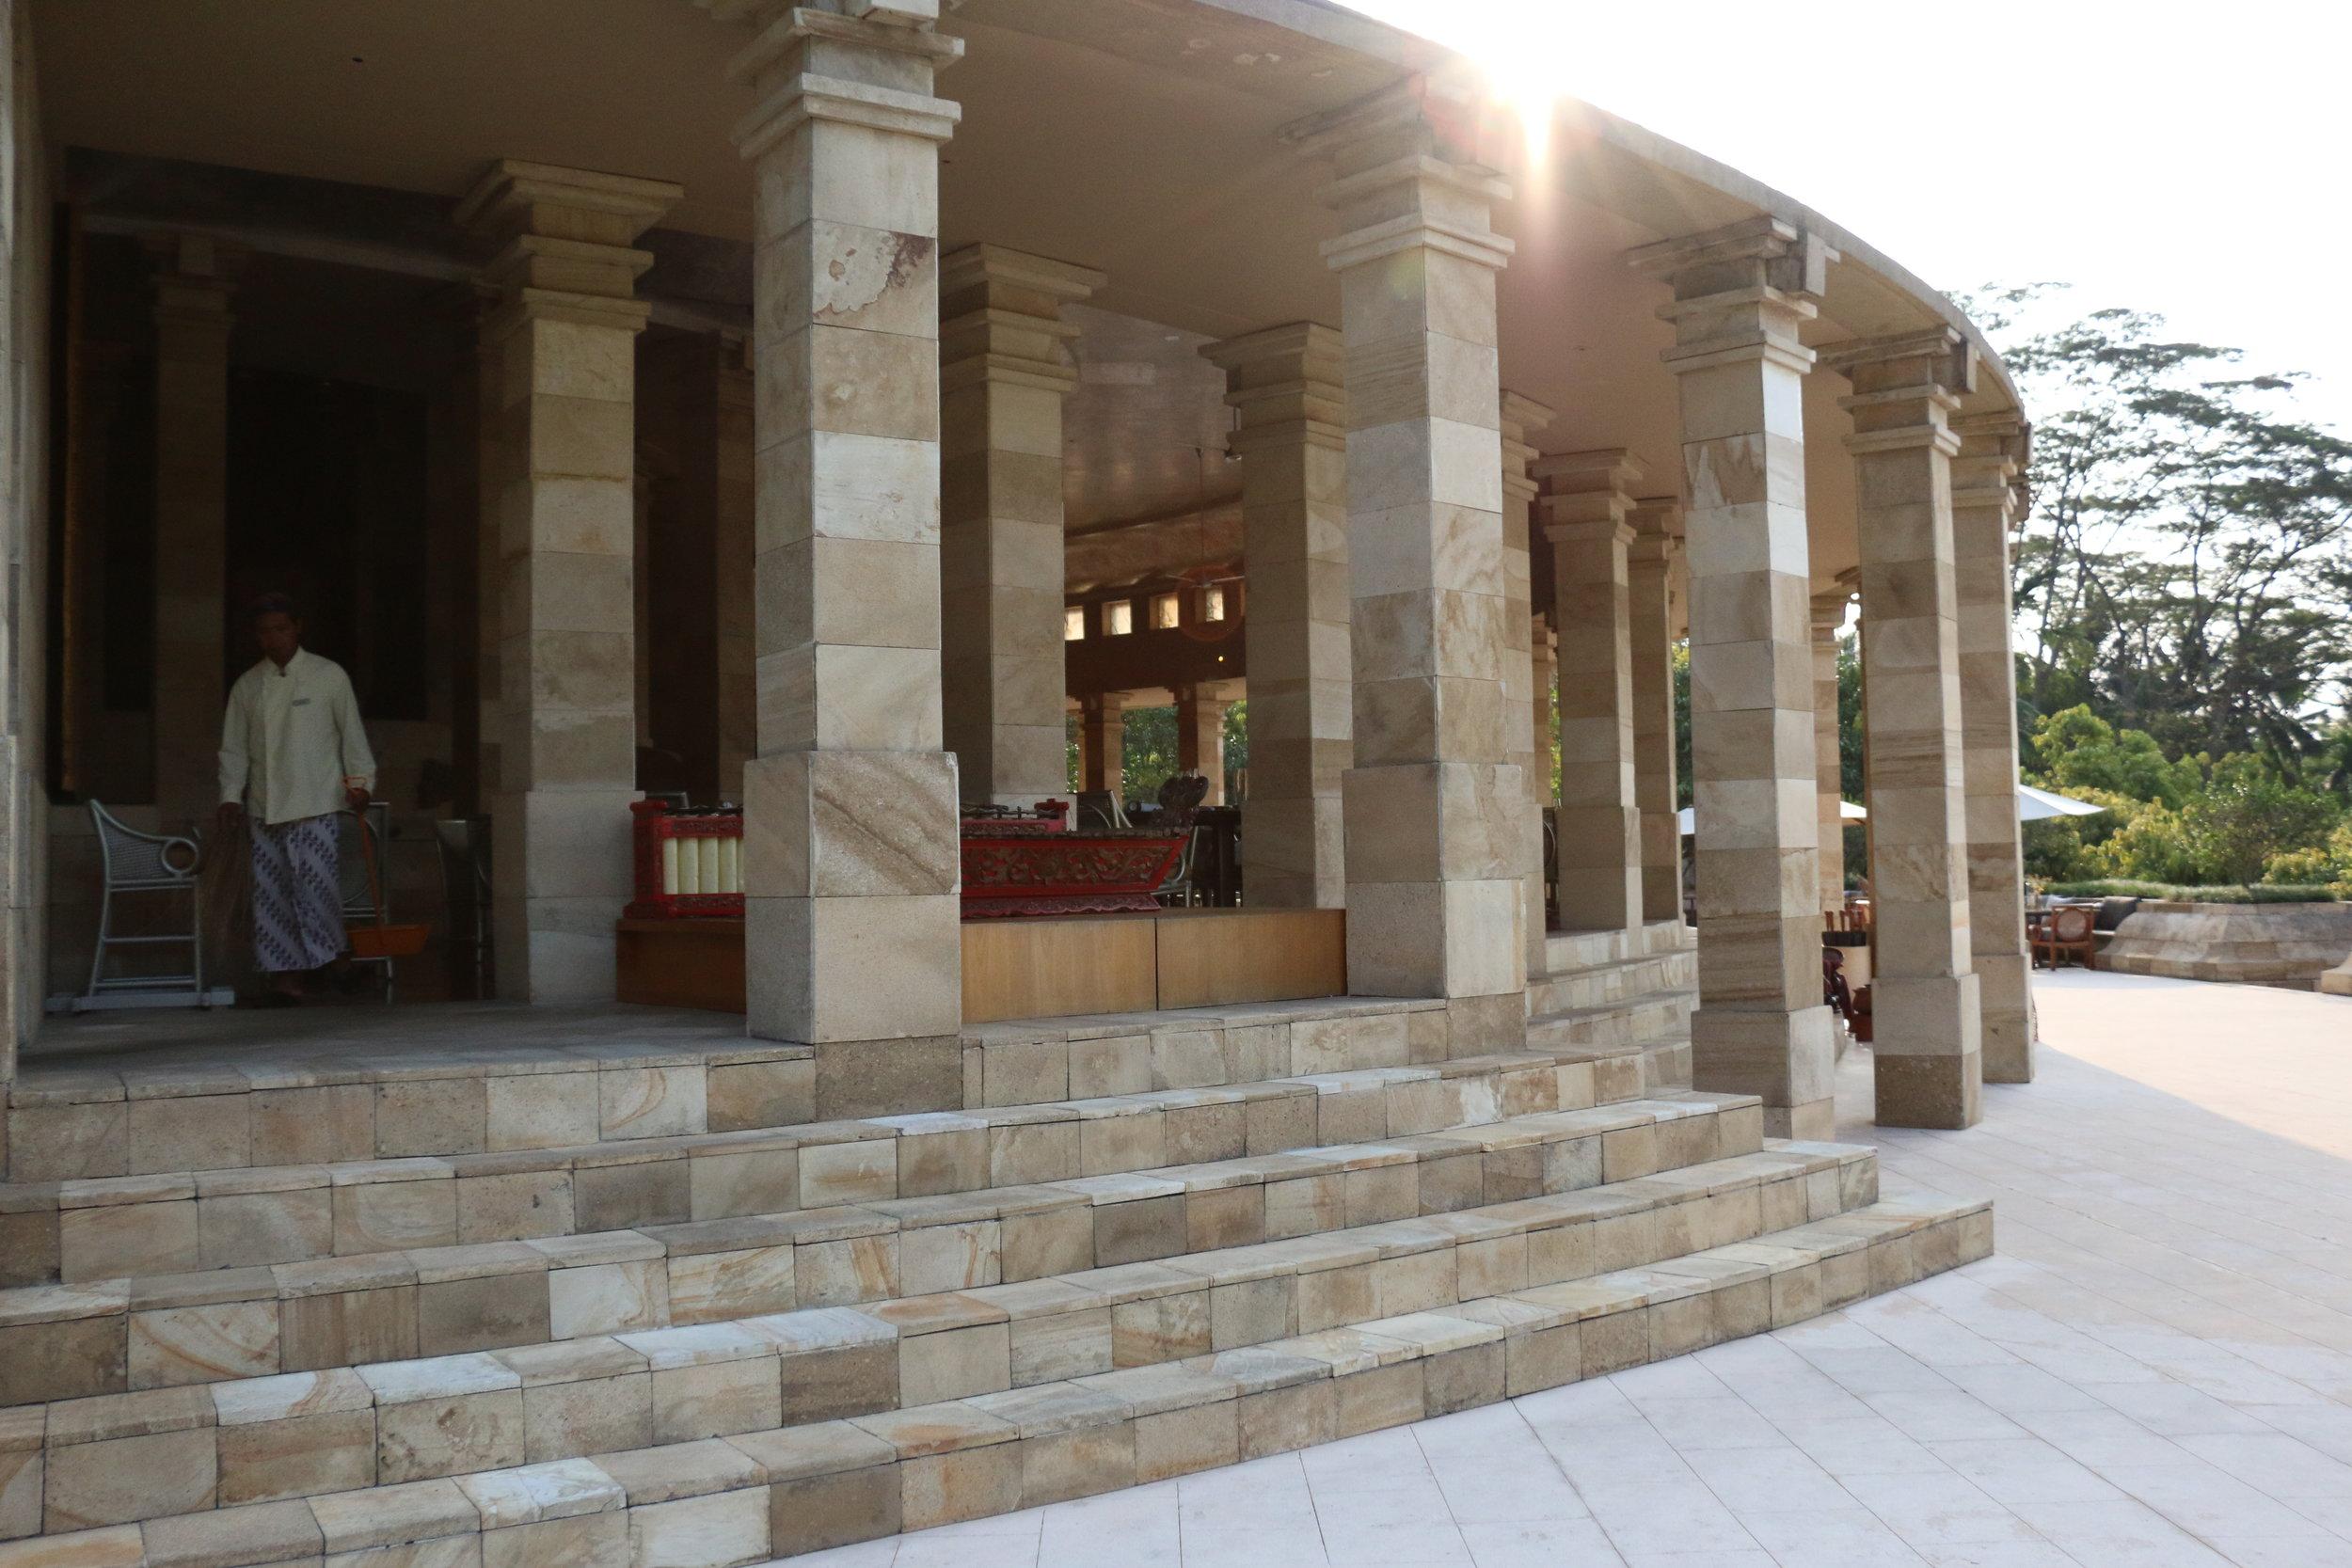 Walk up to the dining room atrium through the stunning pillars